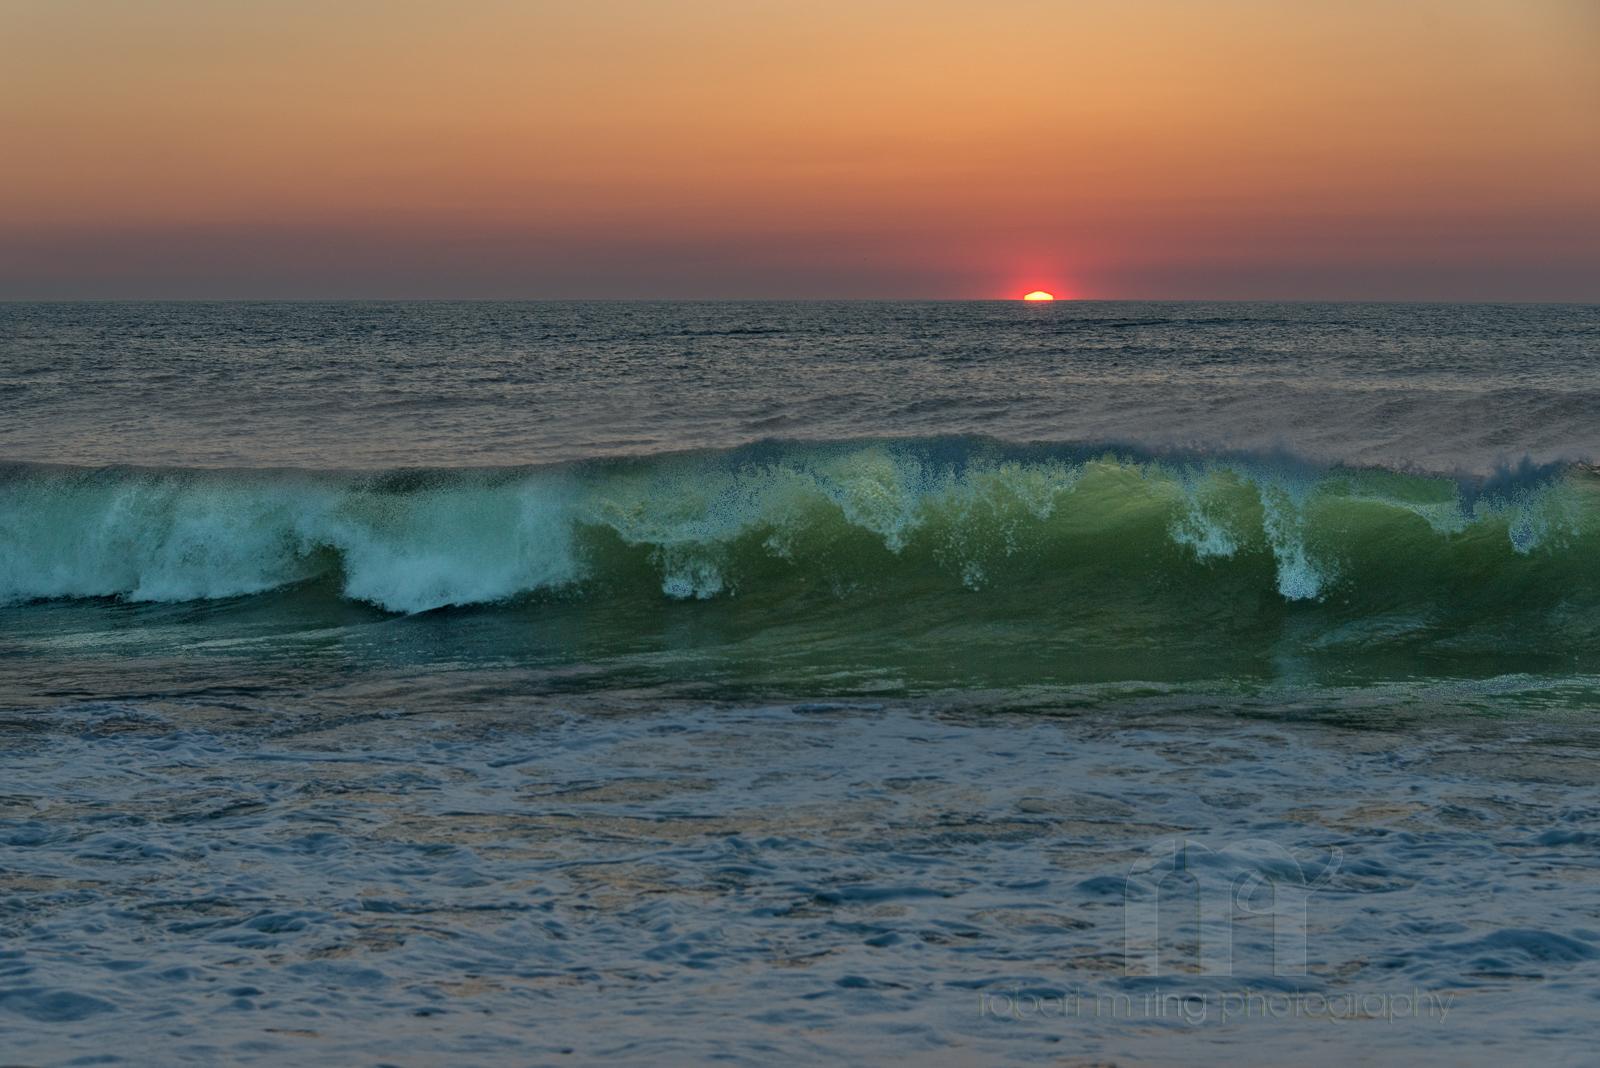 New England, seashore, coast, sunrise, wave, waves, ocean